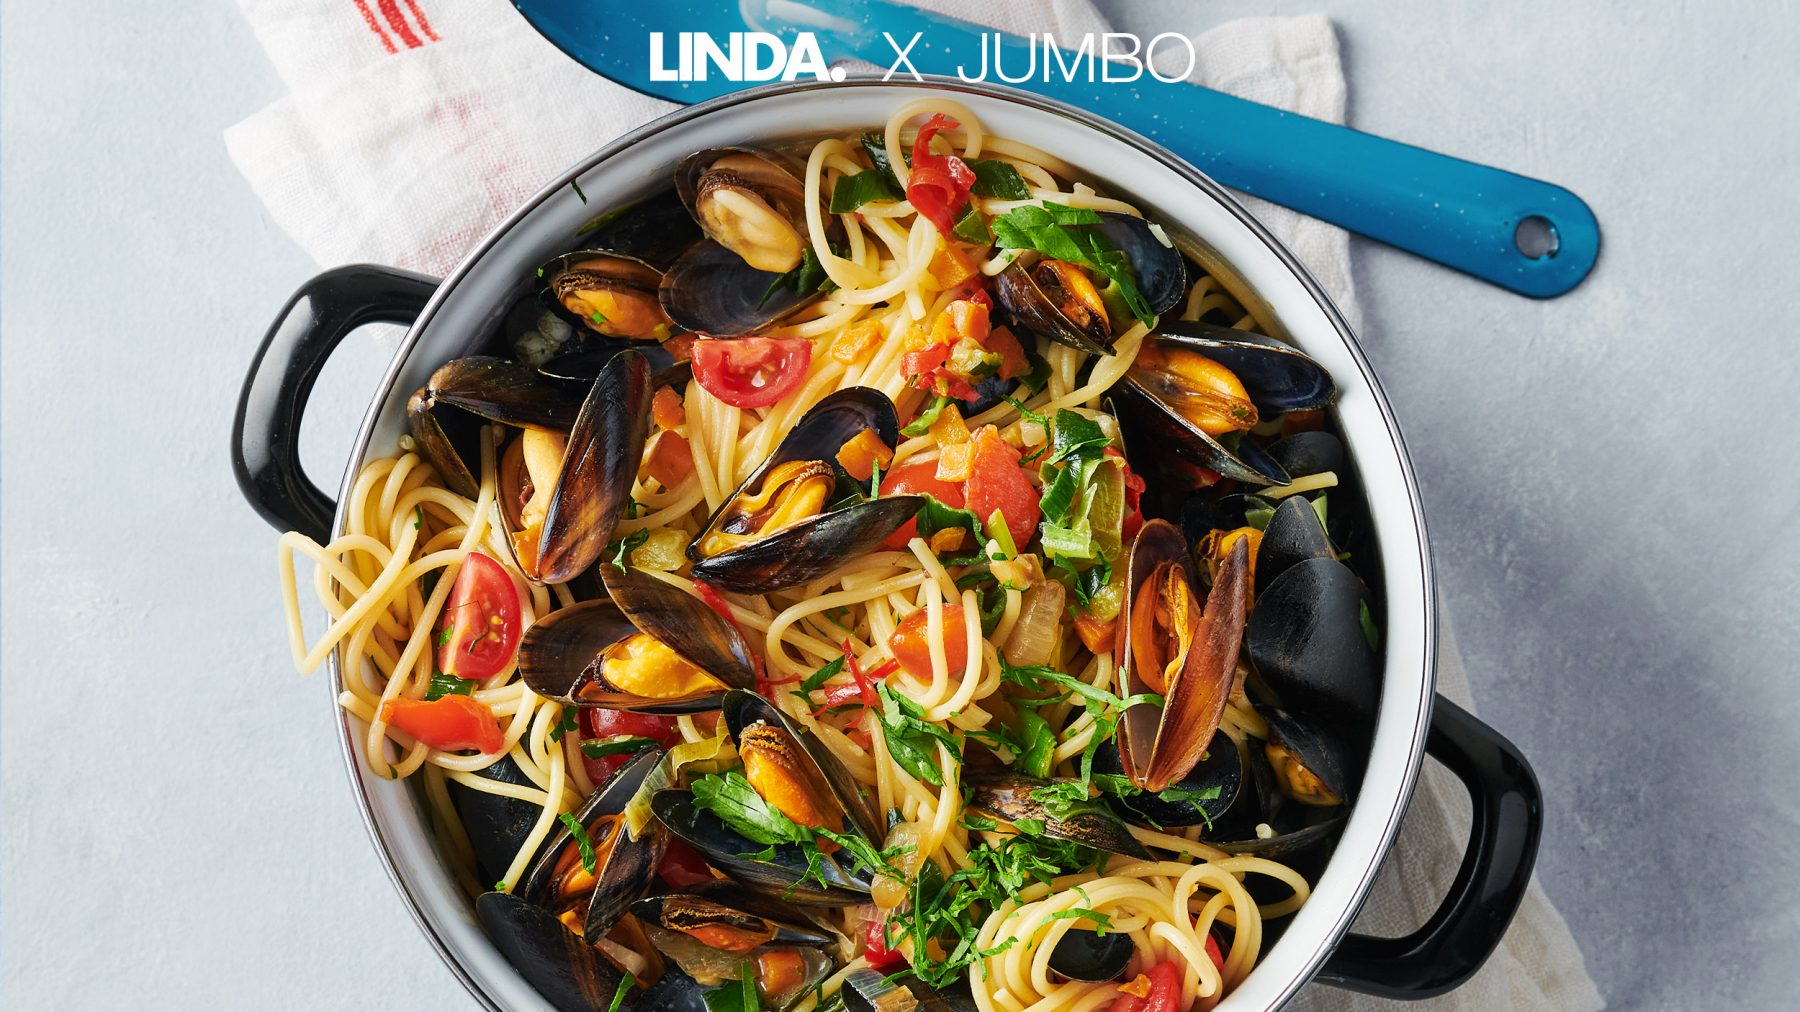 Maak een Italiaans pannetje vol lekkers: spaghetti, mosselen en lekker veel groenten